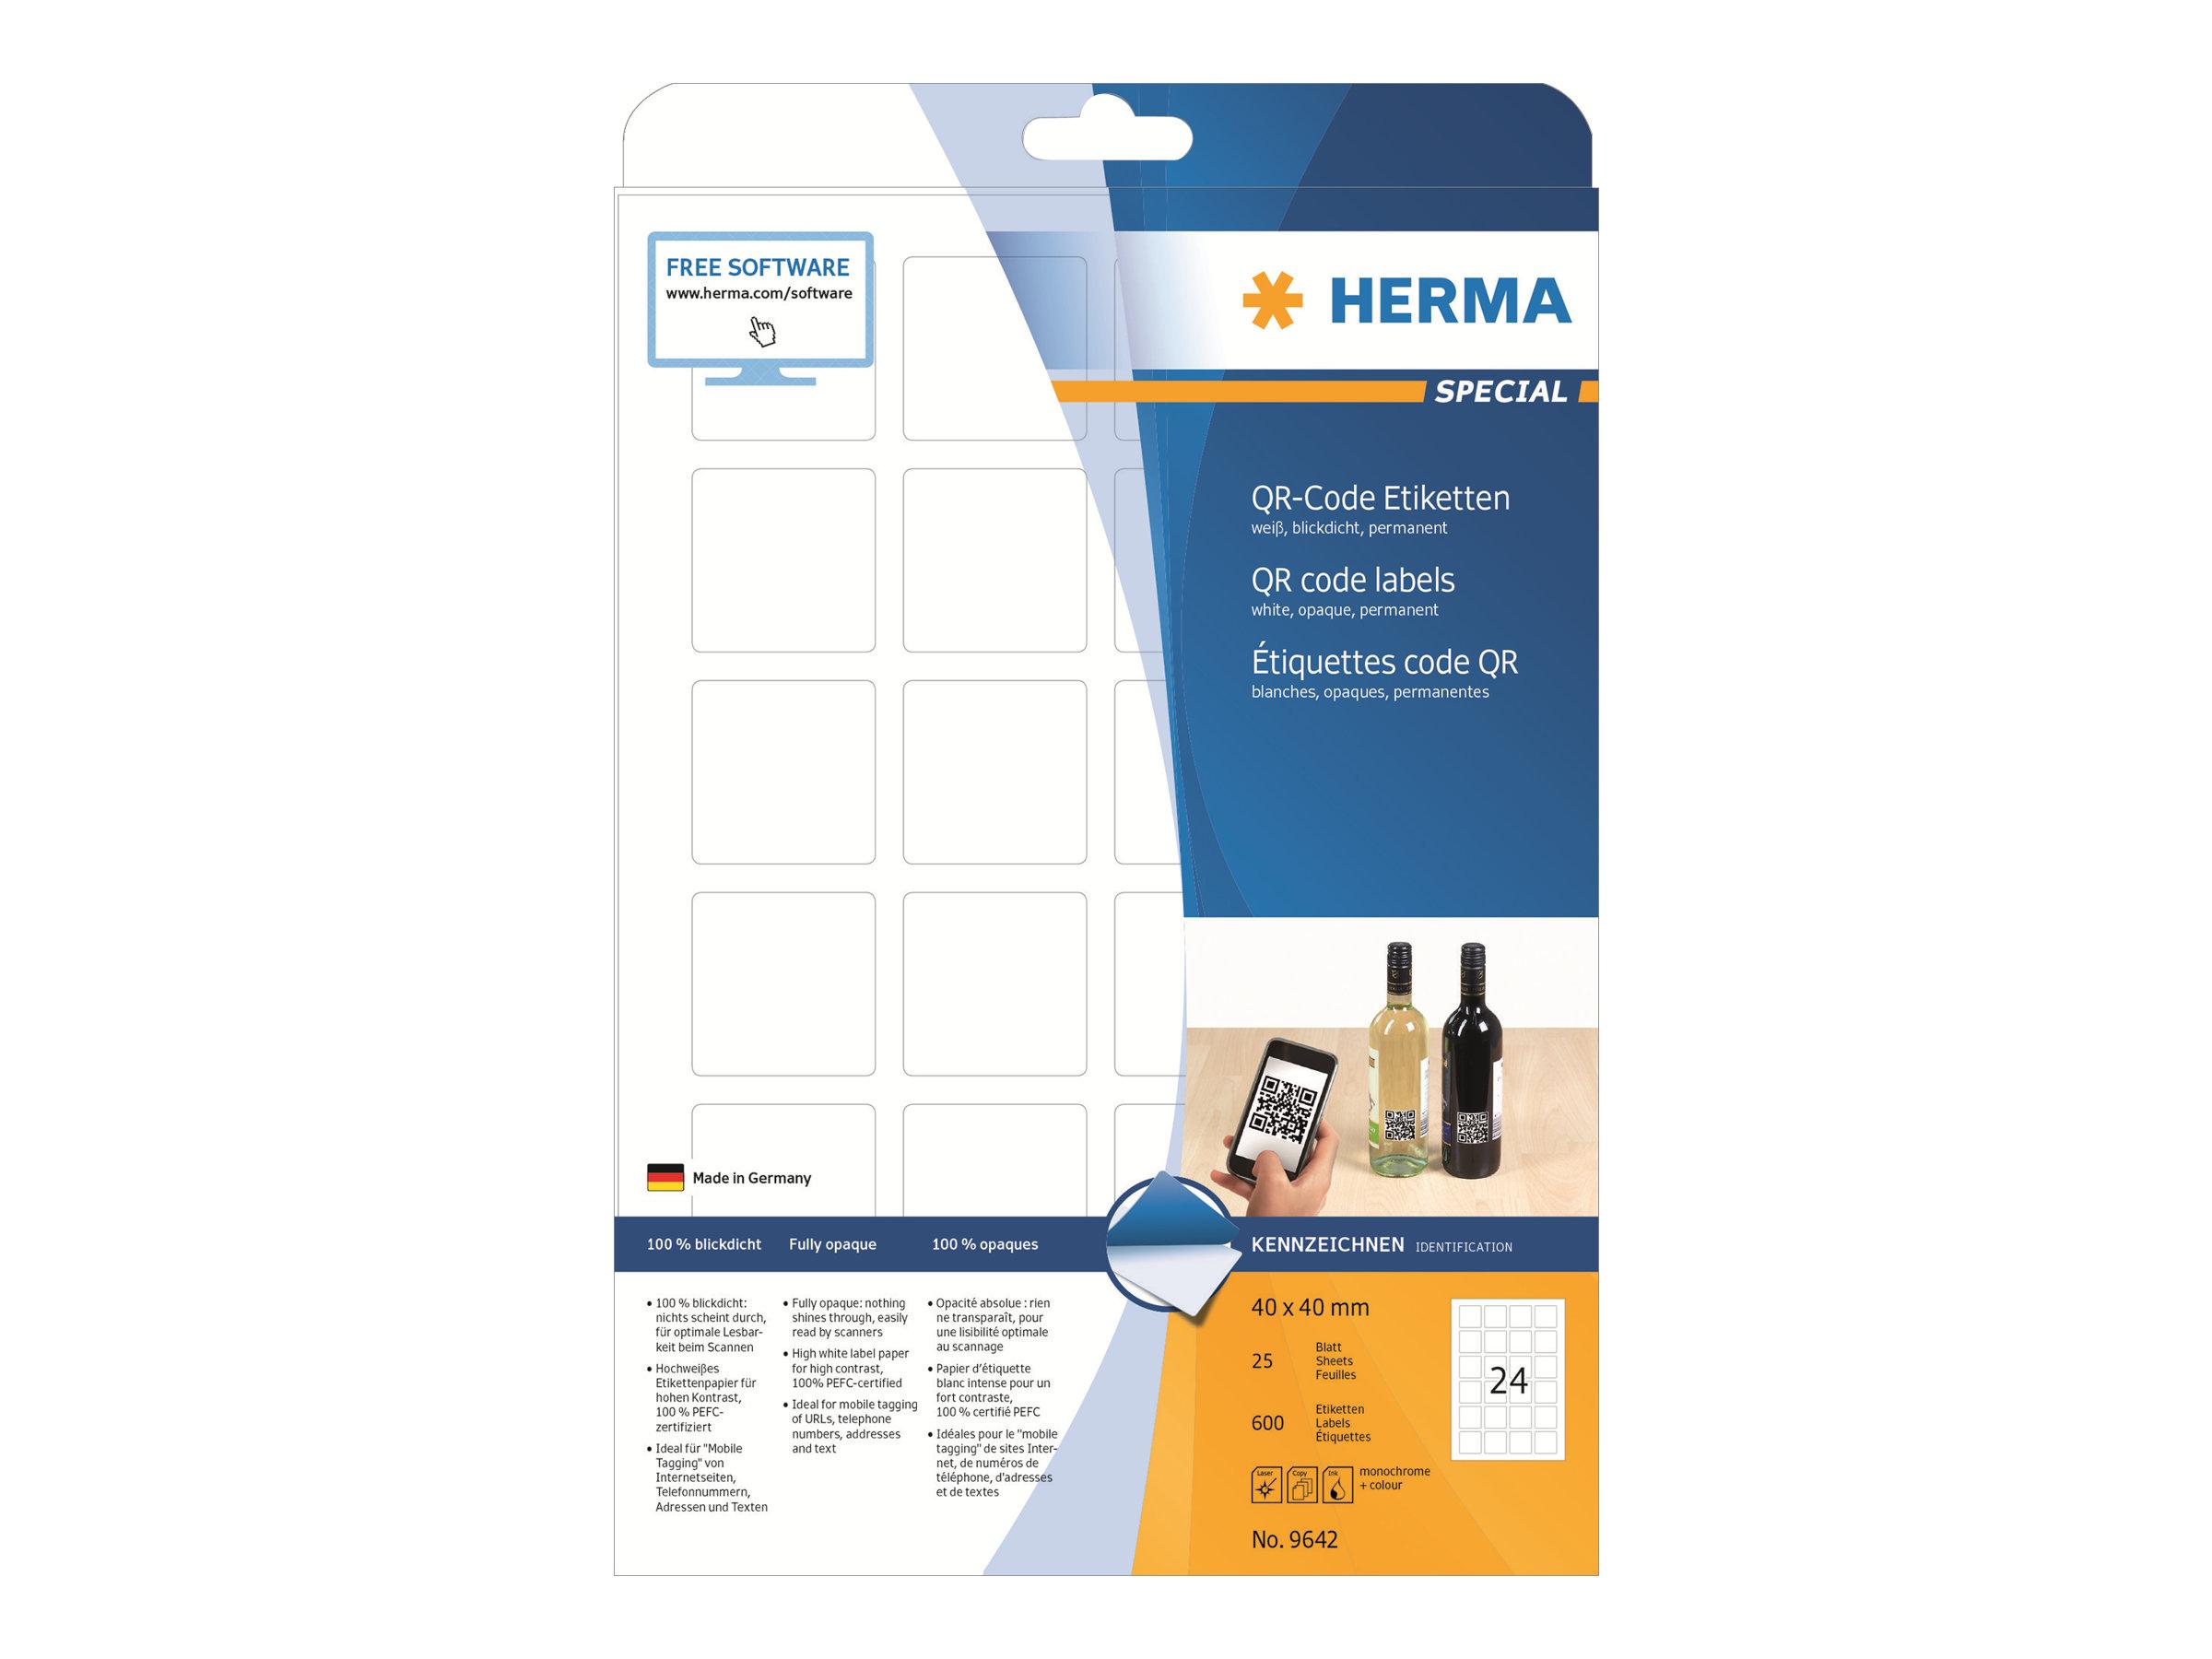 HERMA Special - Papier - matt - permanent selbstklebend - weiß - 40 x 40 mm 600 Etikett(en) (25 Bogen x 24)